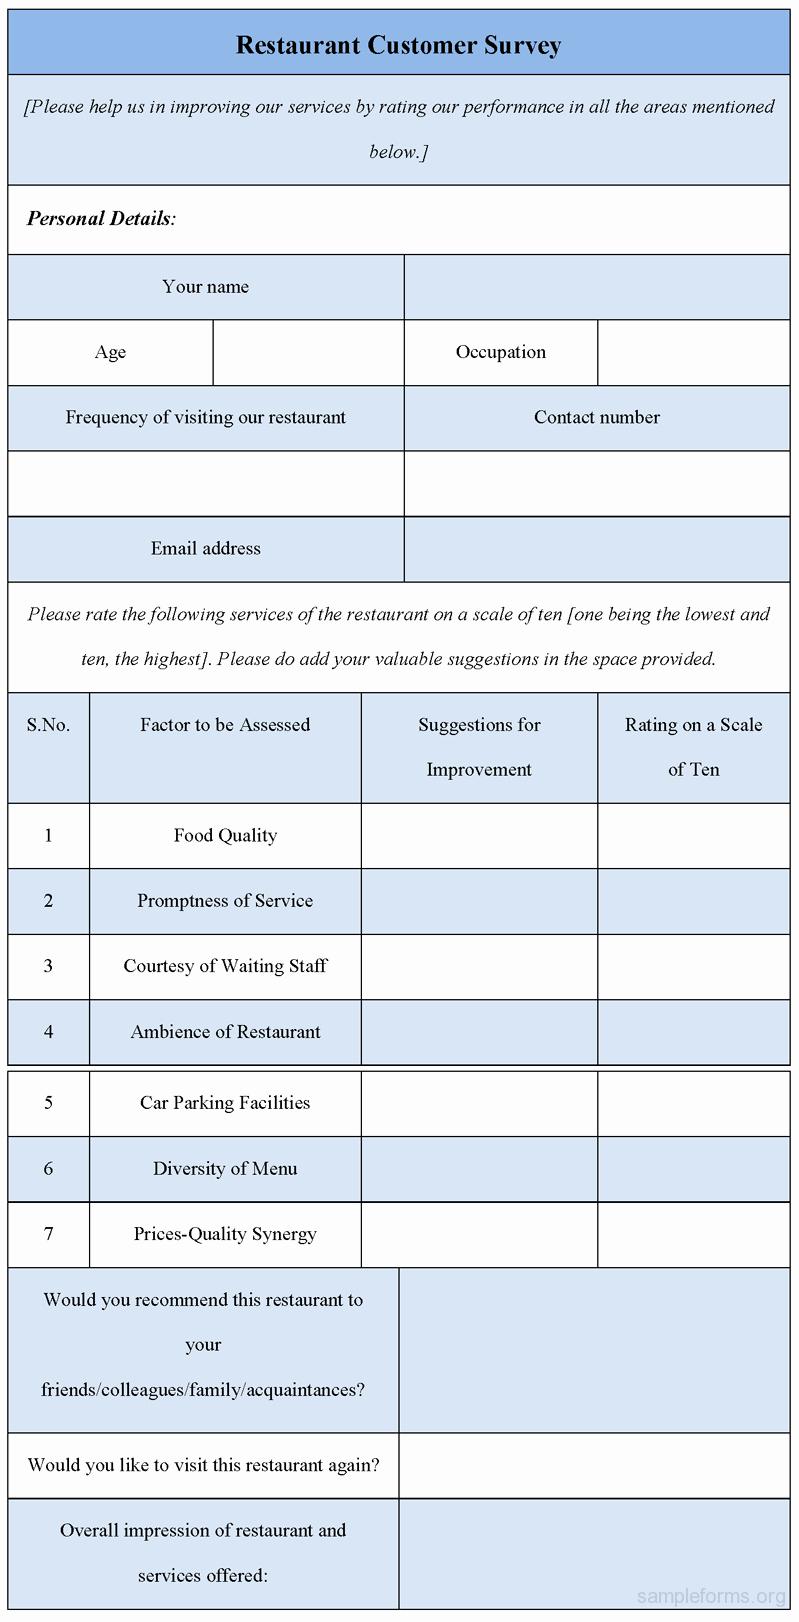 Restaurant Customer Satisfaction Survey Inspirational Restaurant Customer Survey form Sample forms